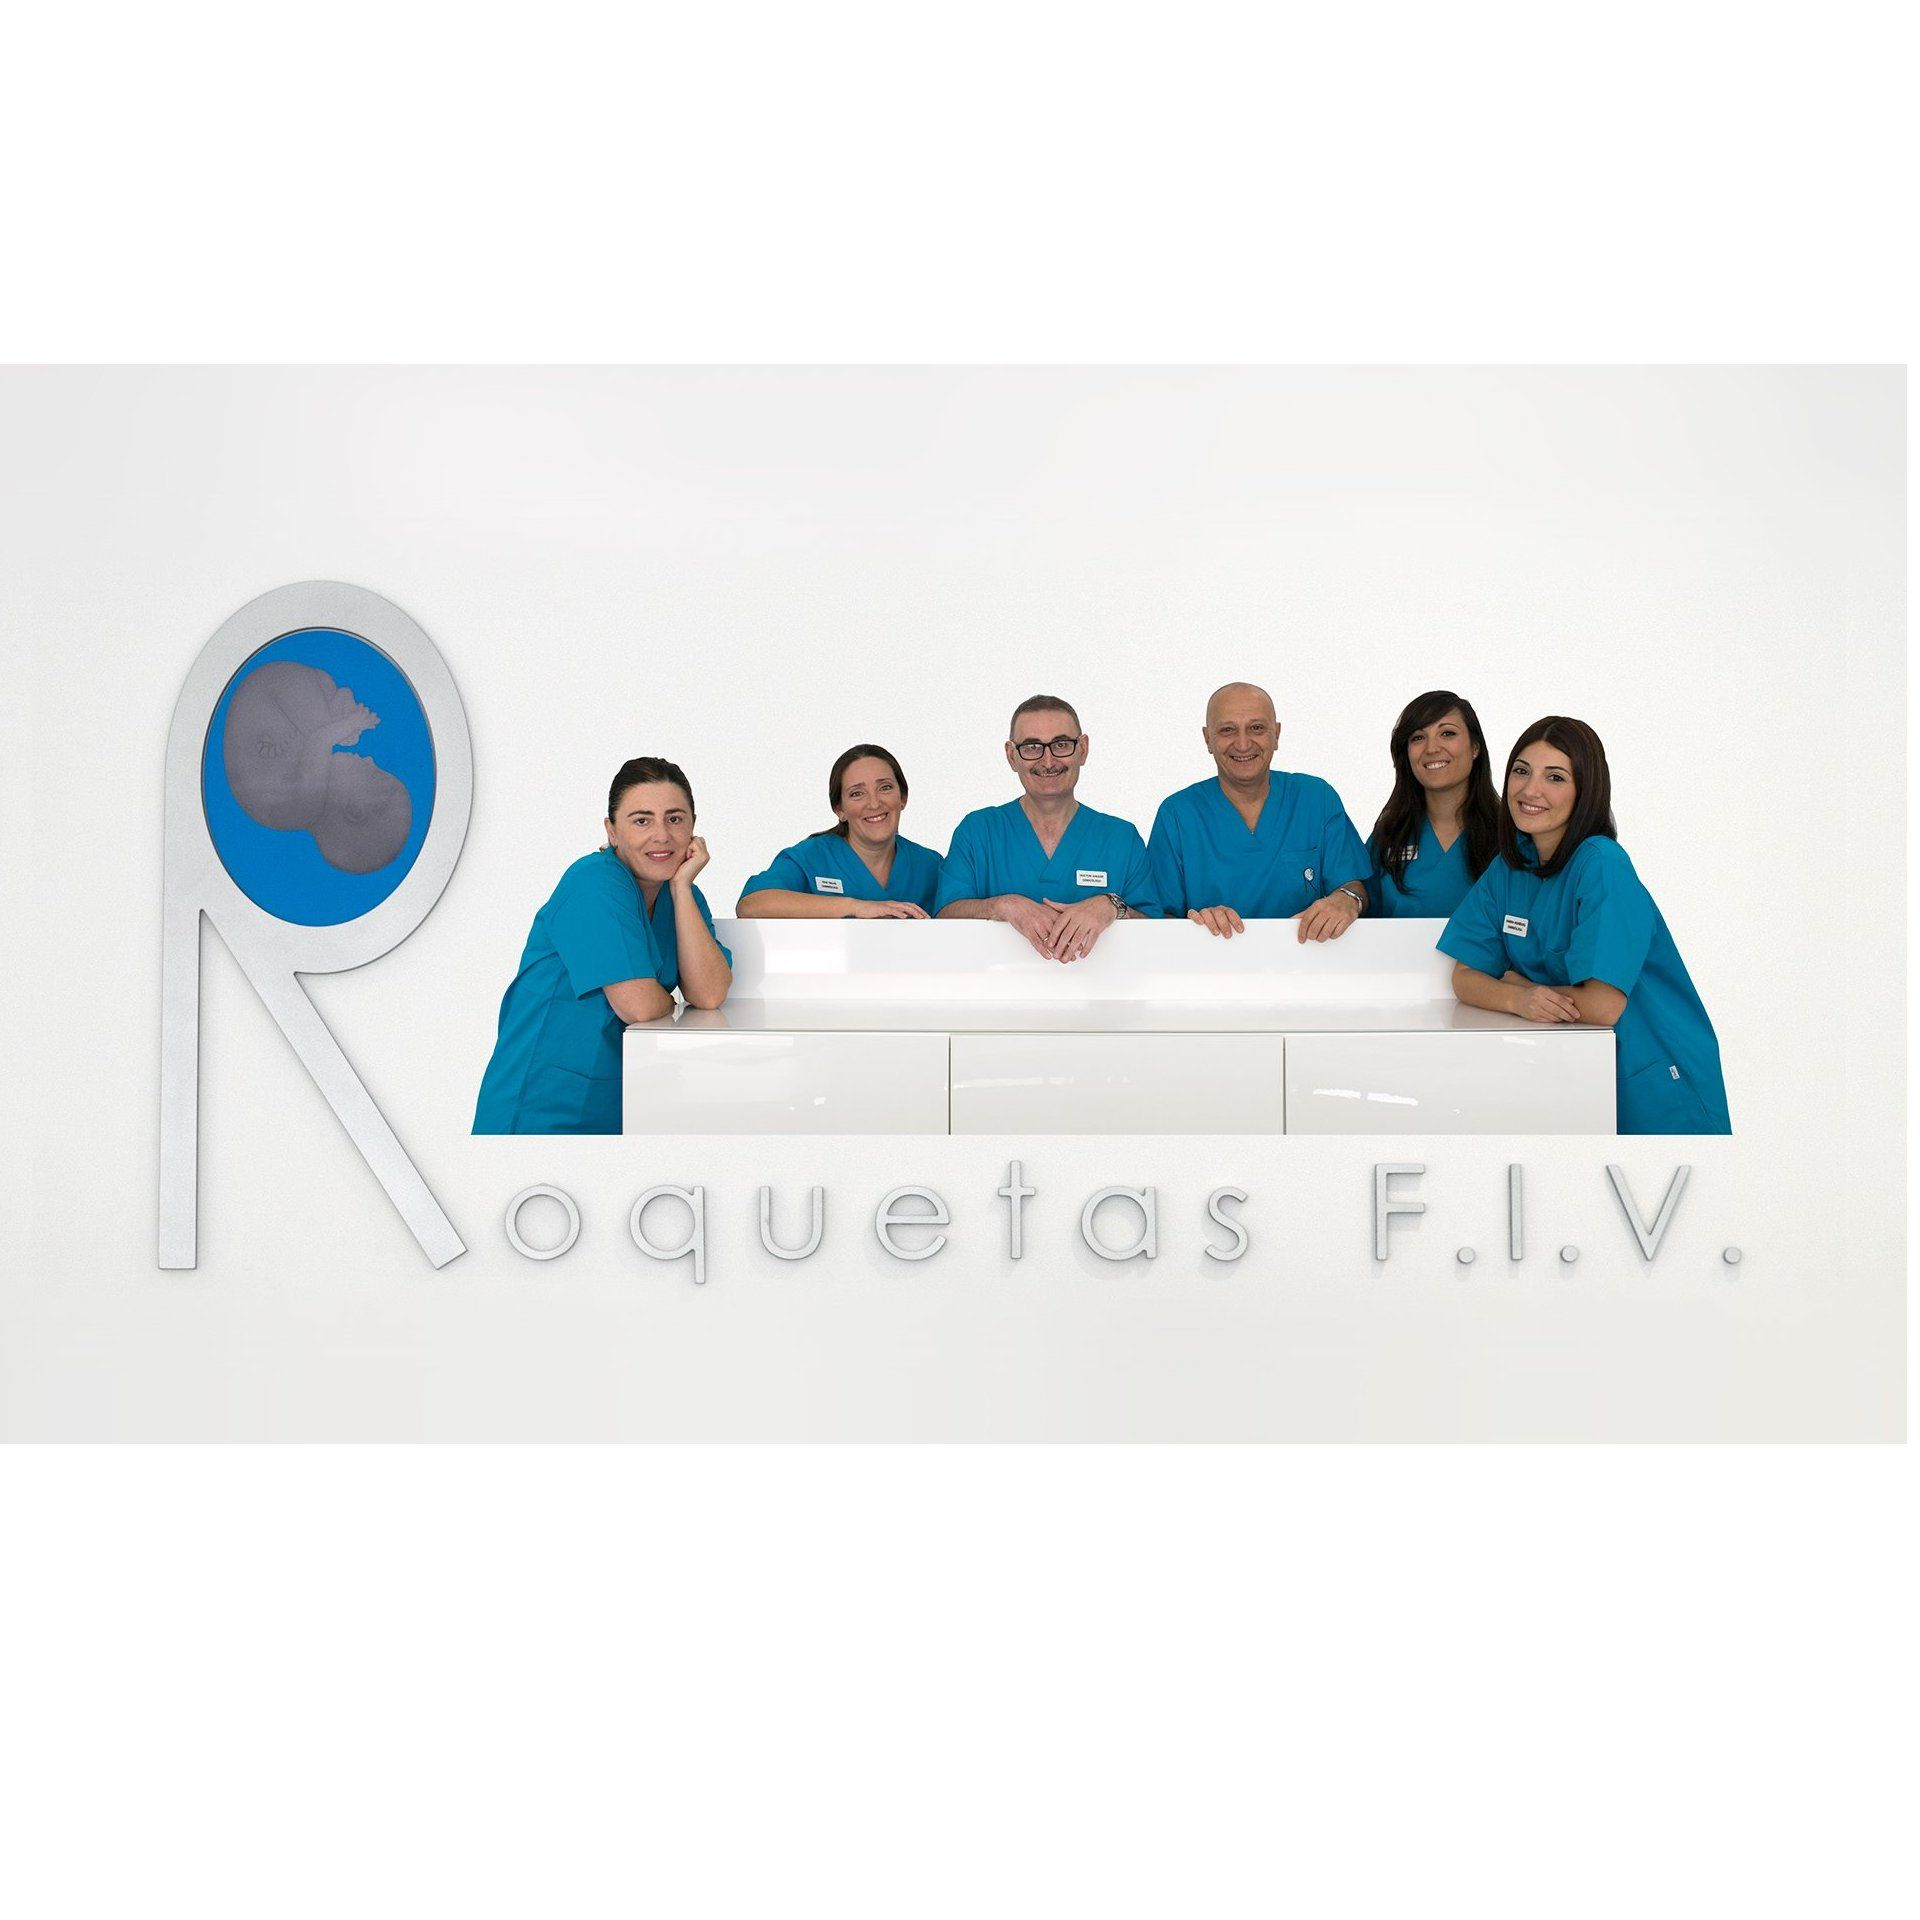 Equipo: Servicios de Clínica Roquetas F.I.V.